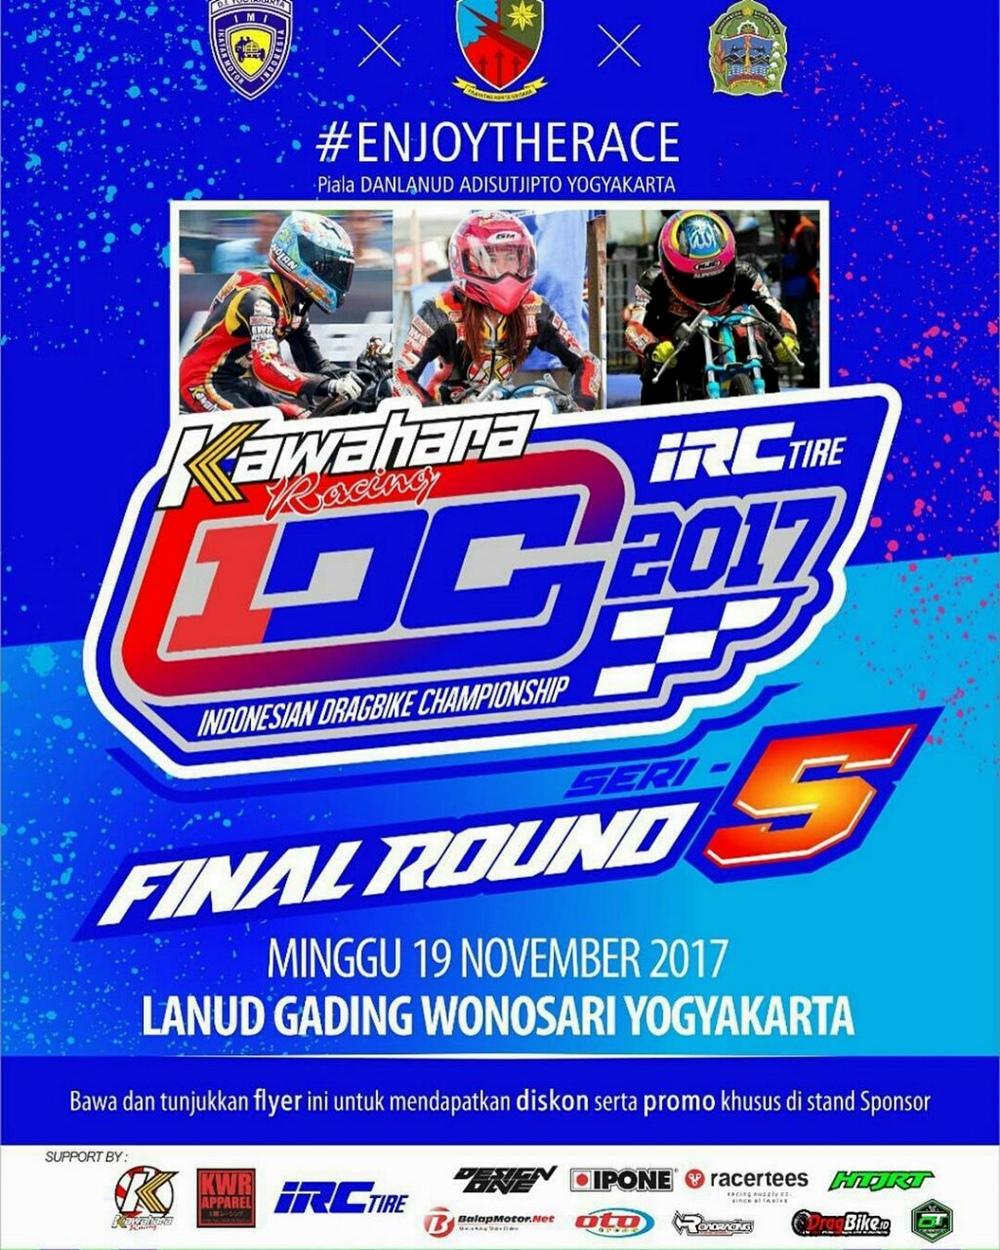 Agenda: Kawahara IRC Indonesian Dragbike Championship, Yogyakarta 19 November 2017